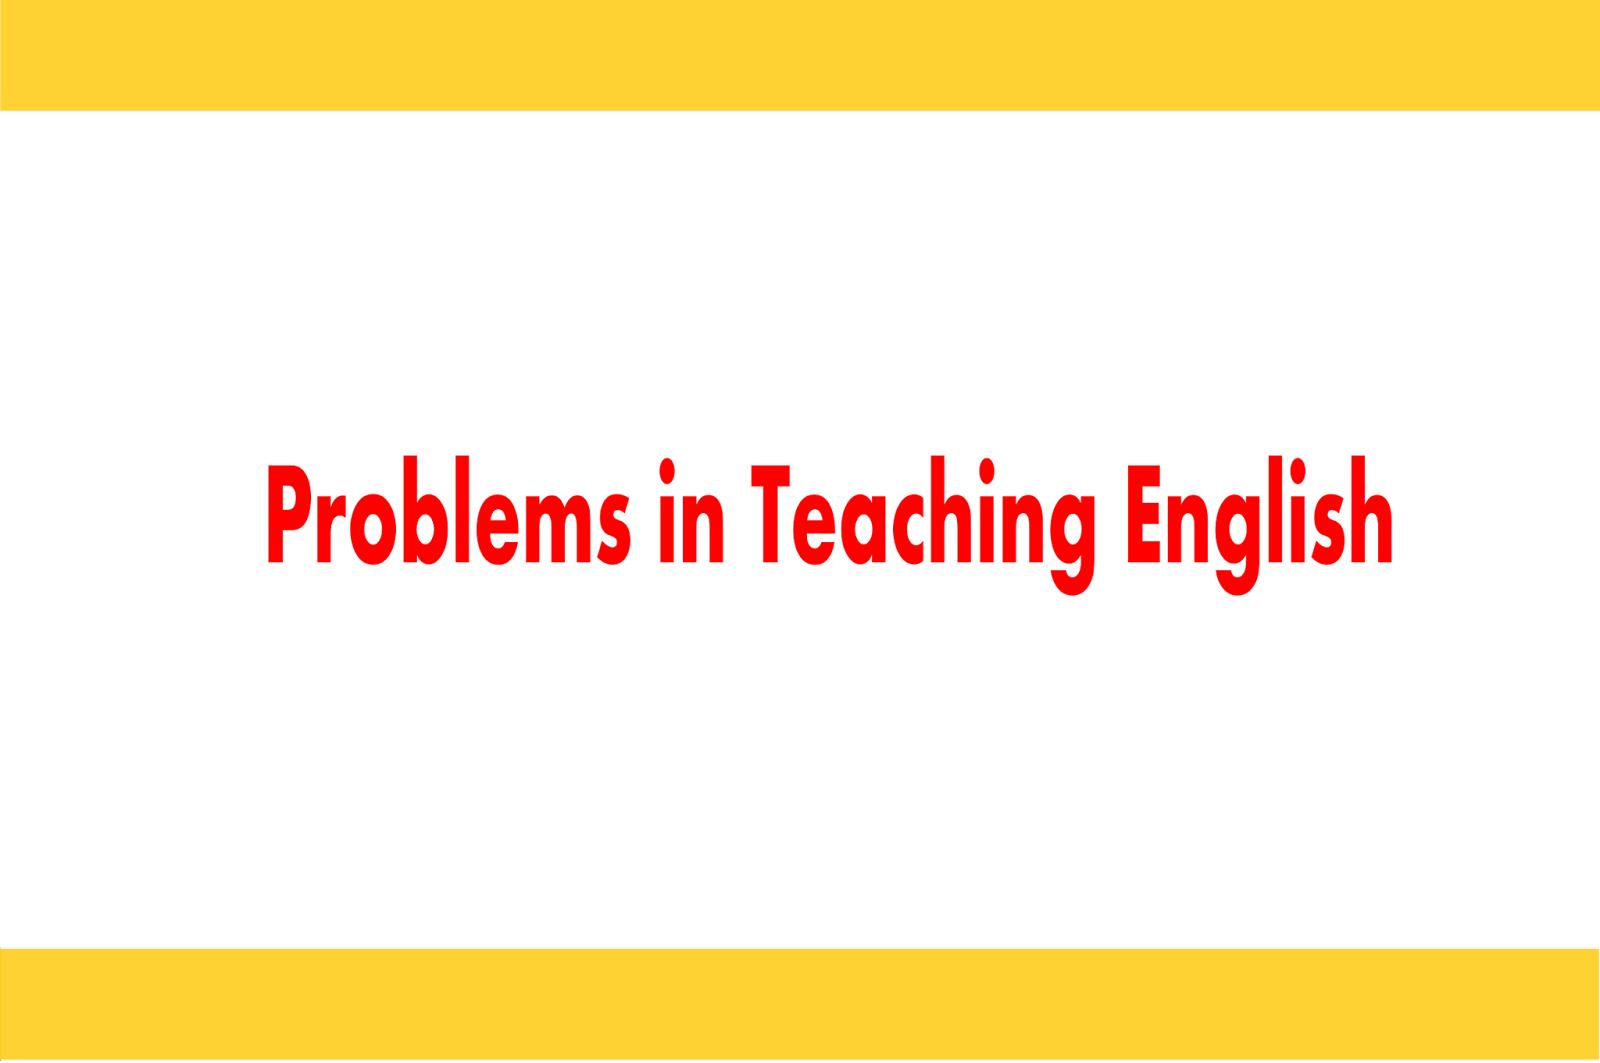 Problems Of Teaching English To Buginese Students Inirumahpintar Com